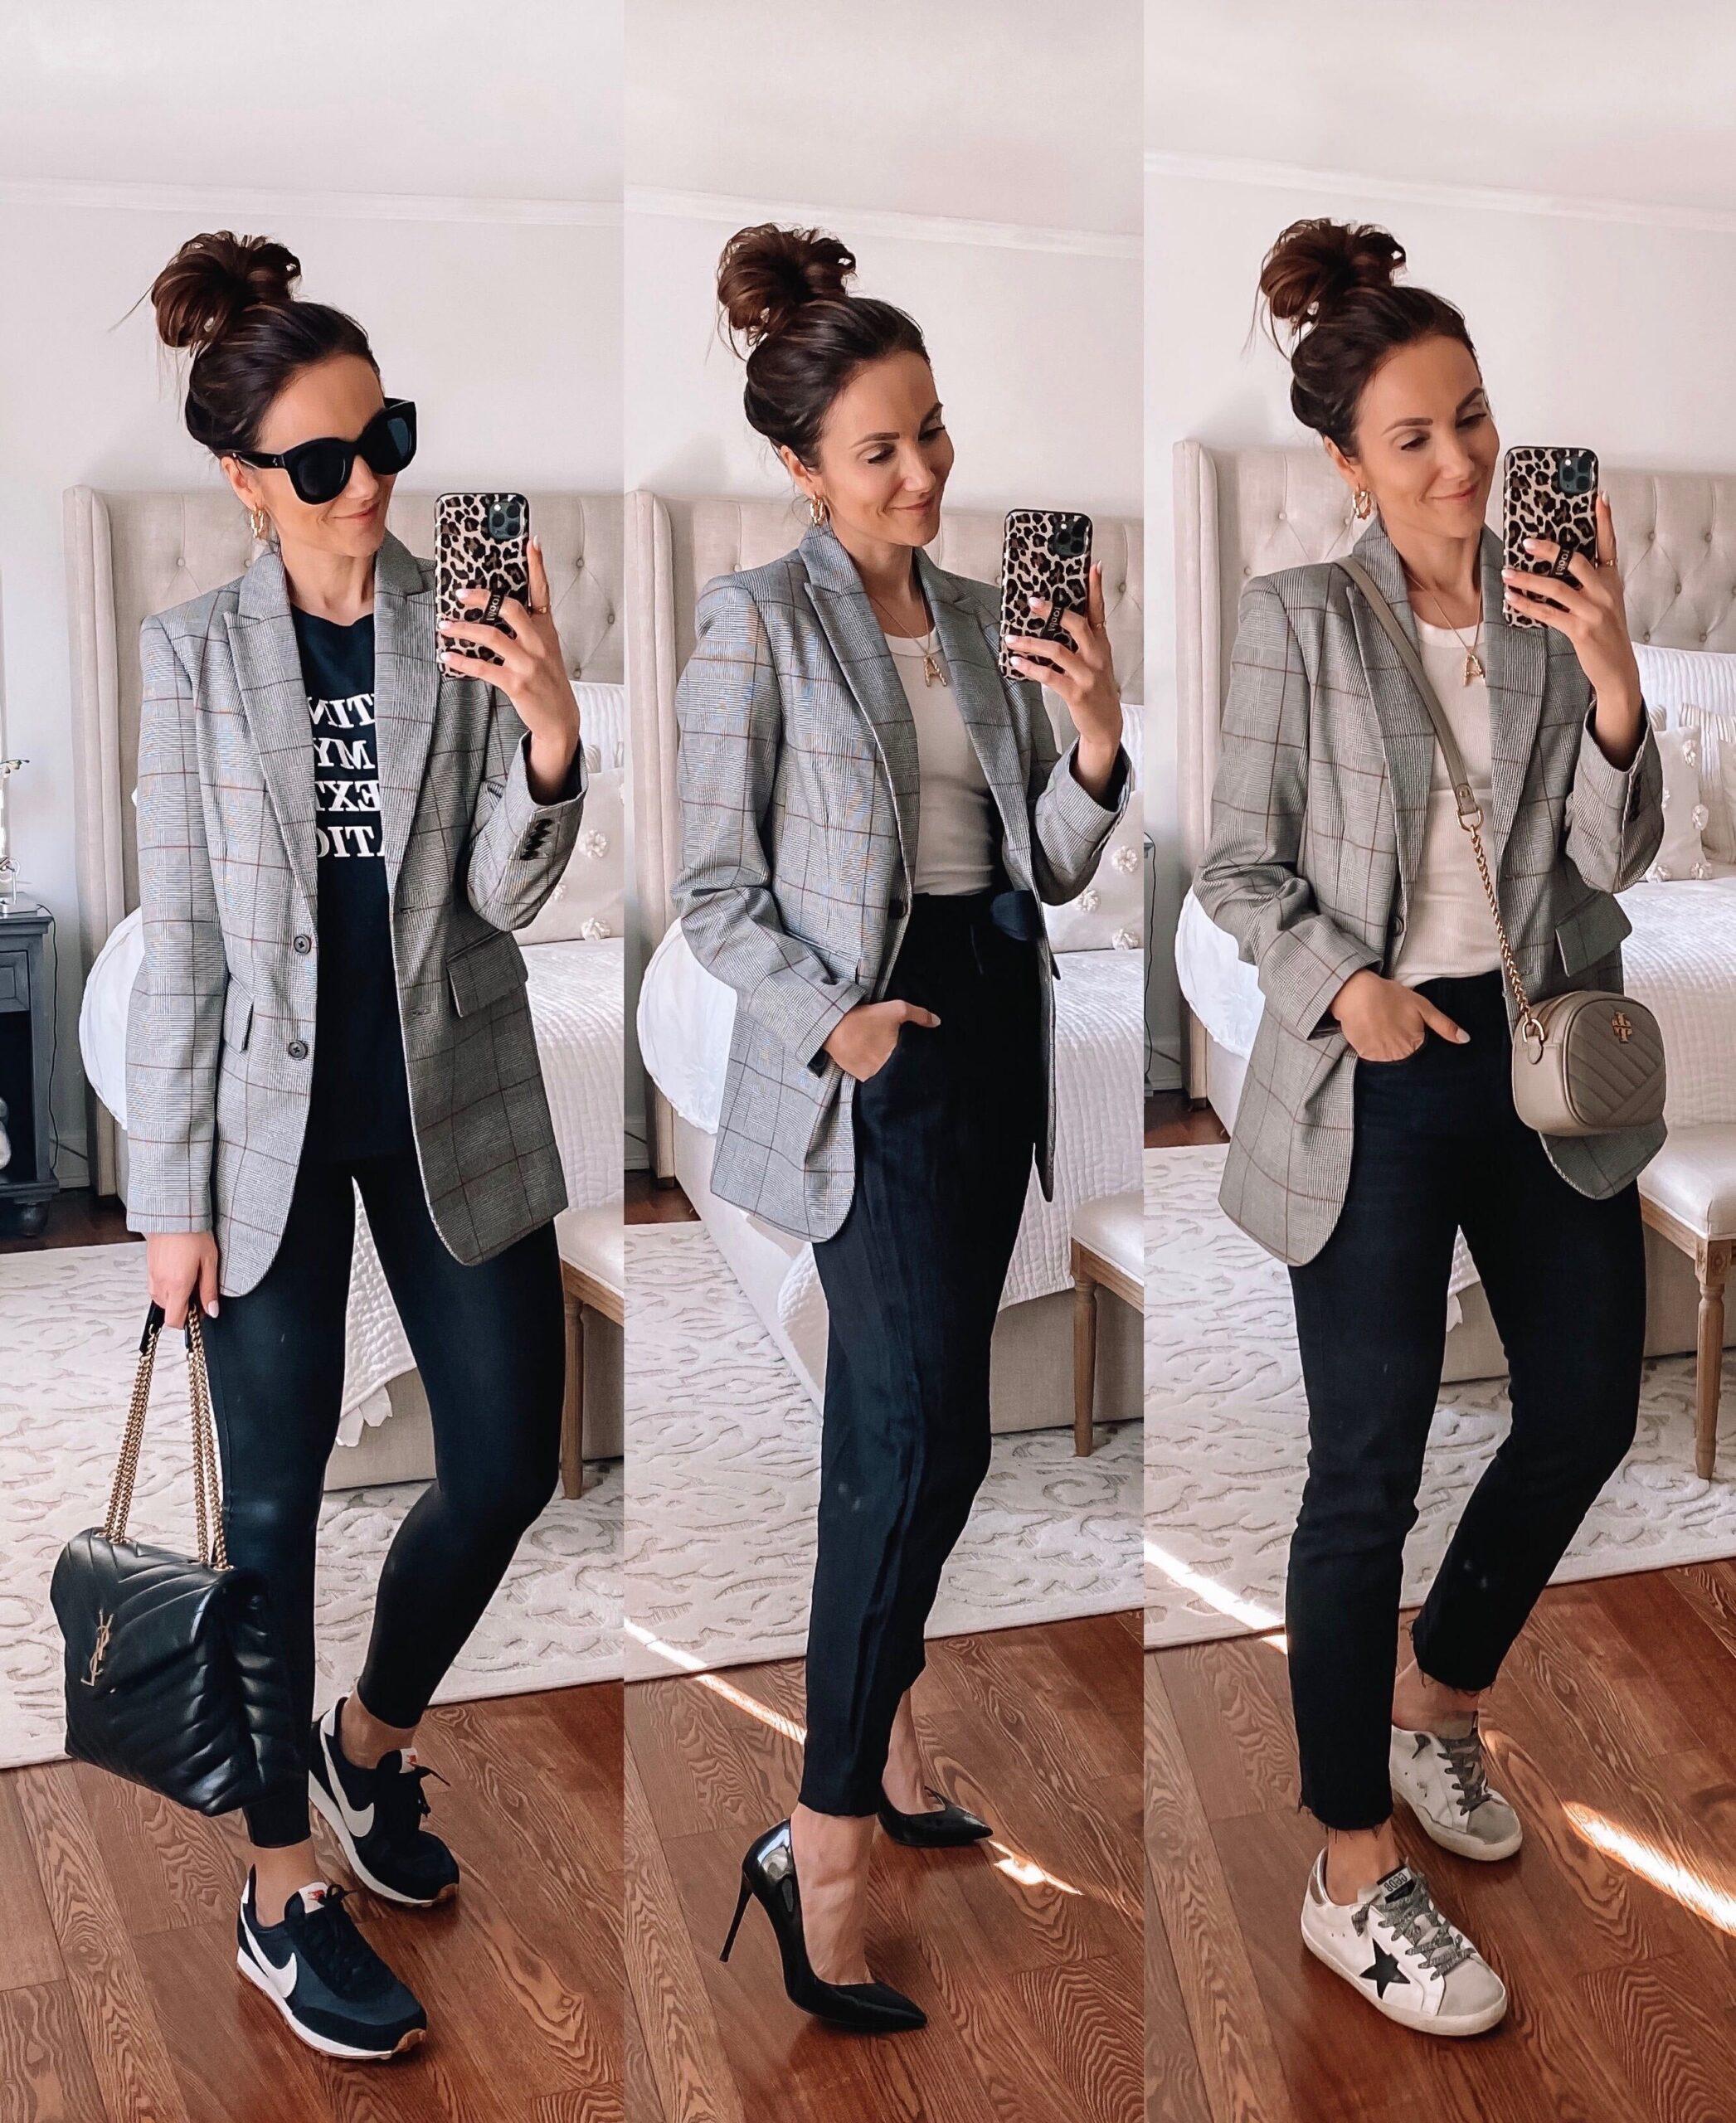 target style, target blazer styled 3 ways